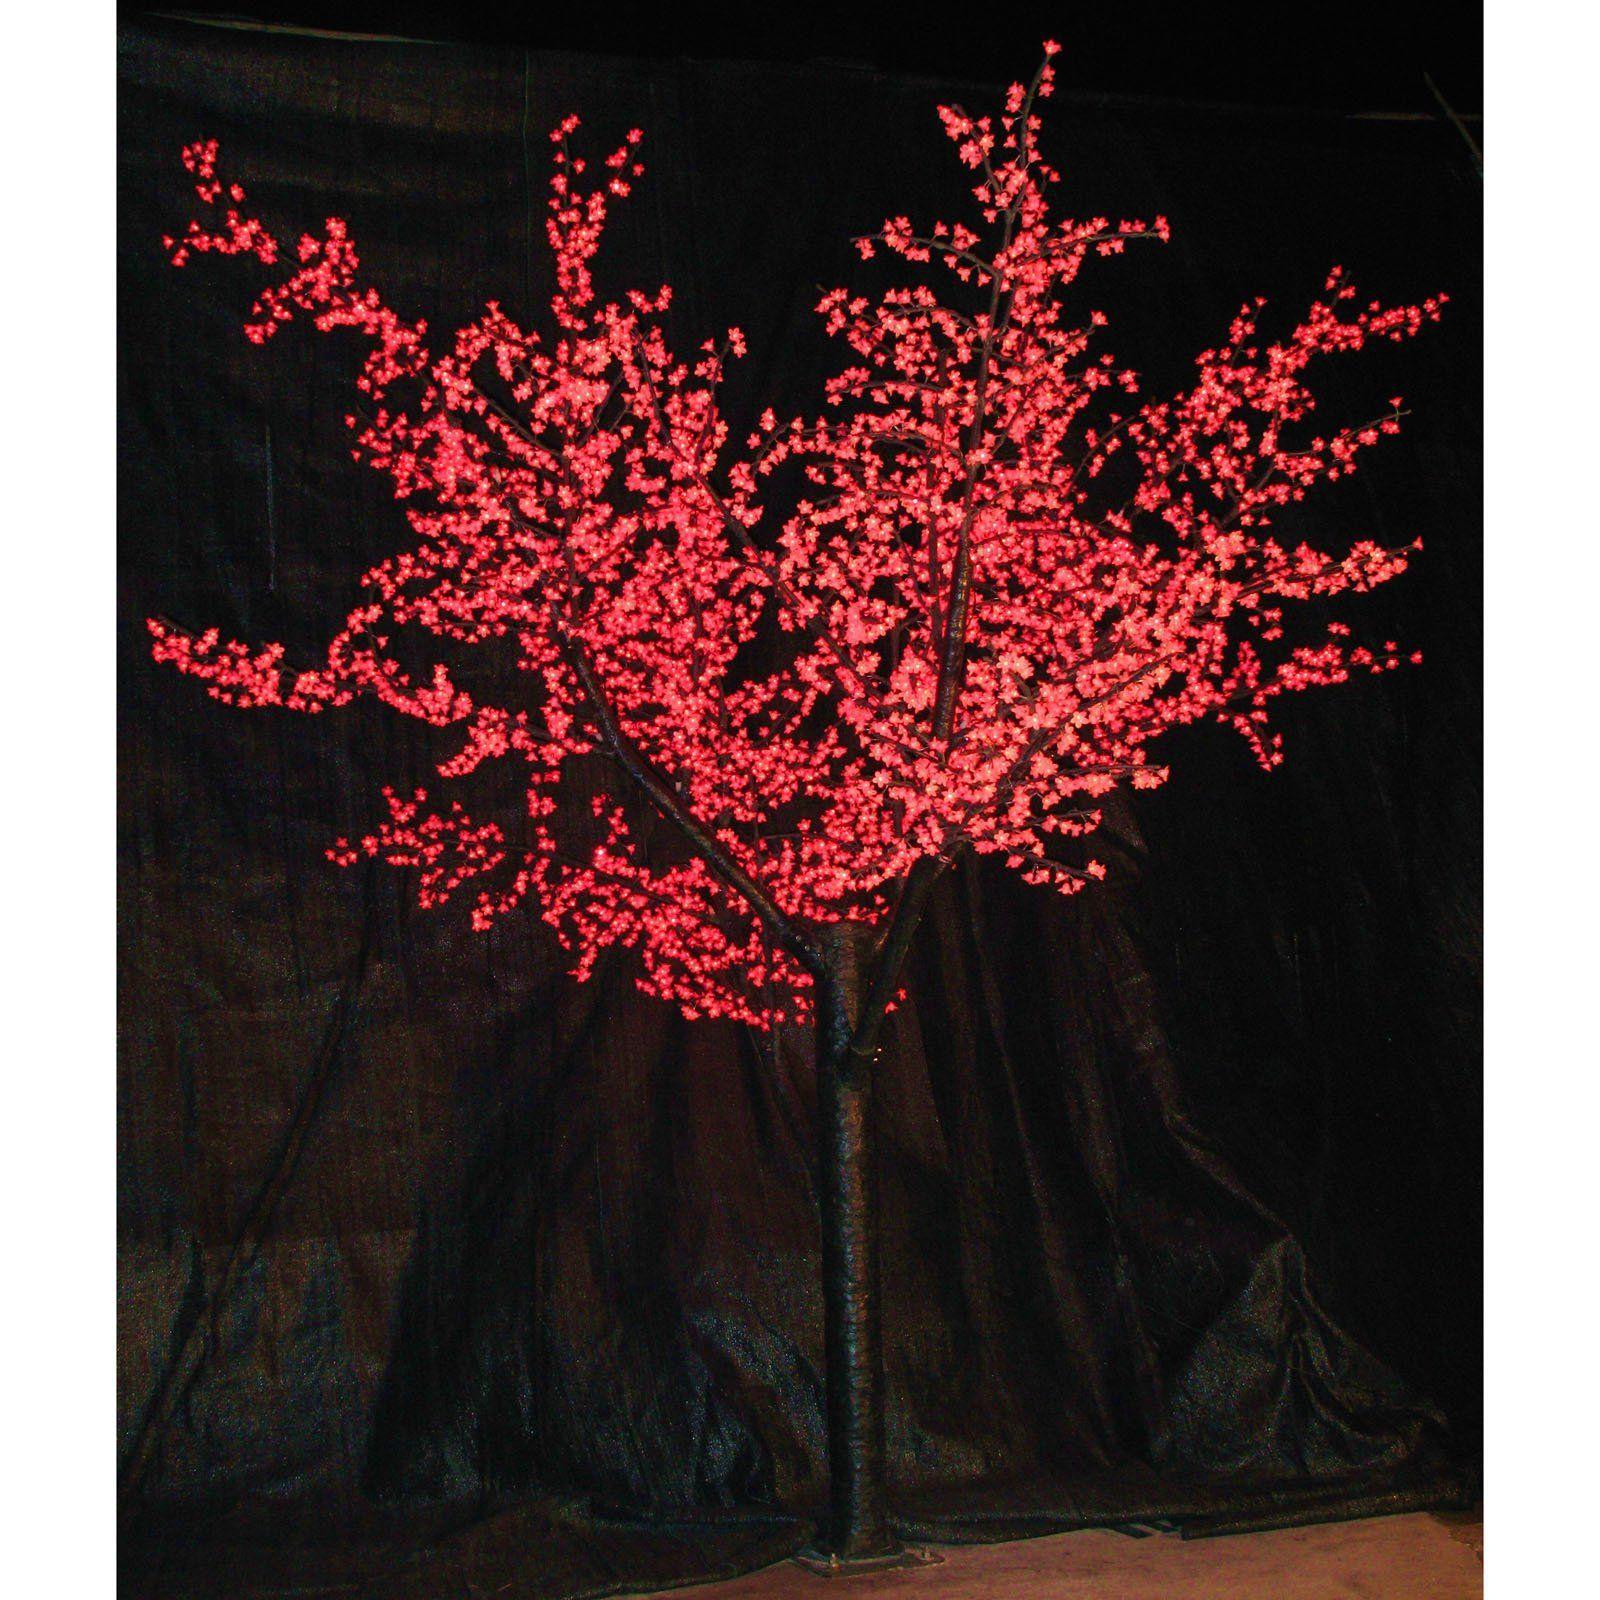 12 Ft Pre Lit Led Cherry Blossom Tree Red Www Hayneedle Com Cherry Blossom Tree Event Decor Direct Led Lights